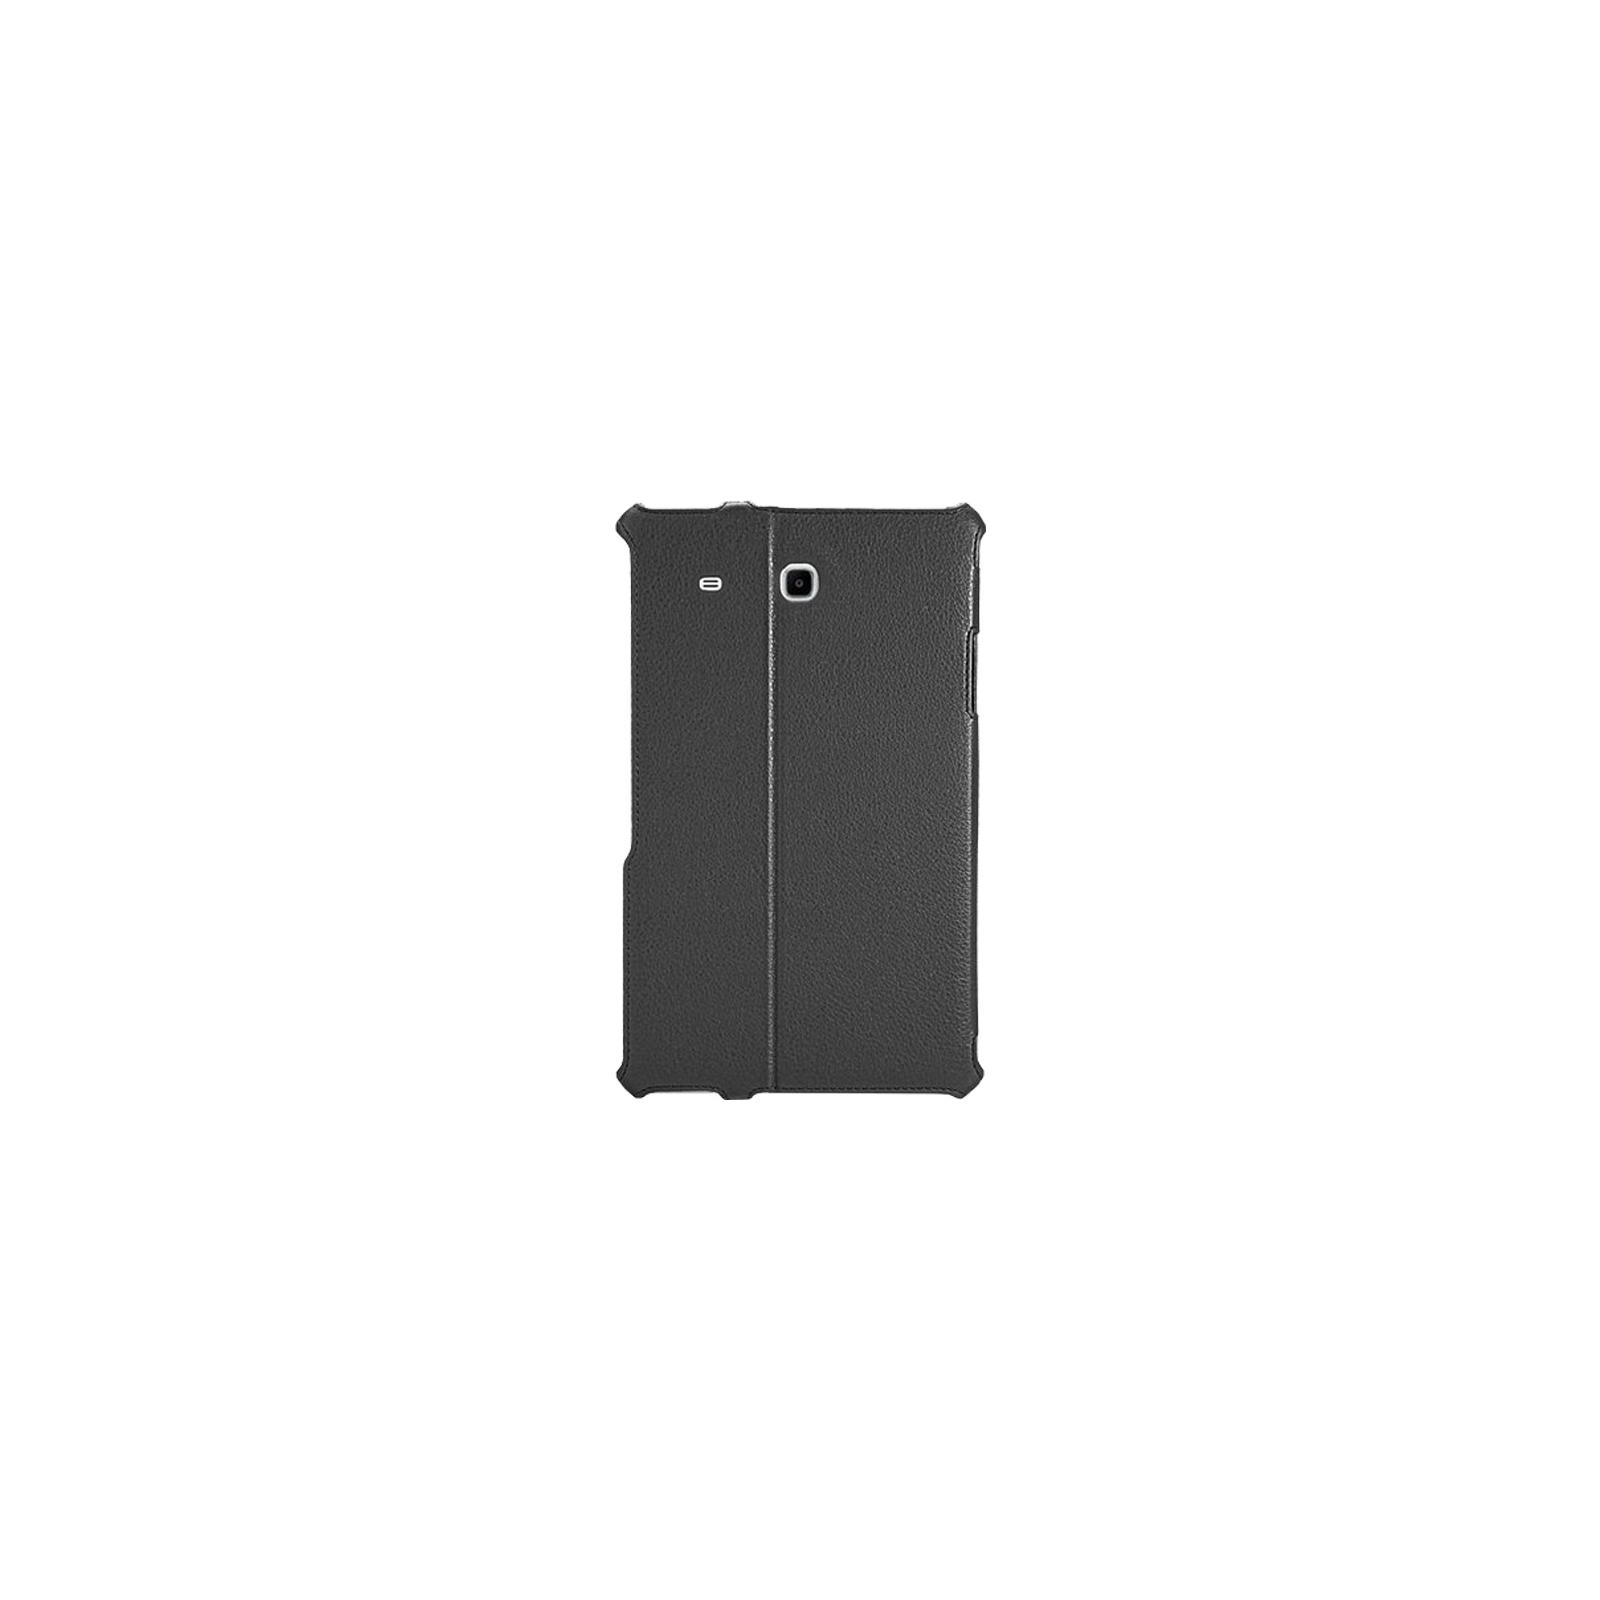 Чехол для планшета AirOn для Samsung Galaxy Tab E 9.6 black (4822352779559) изображение 2